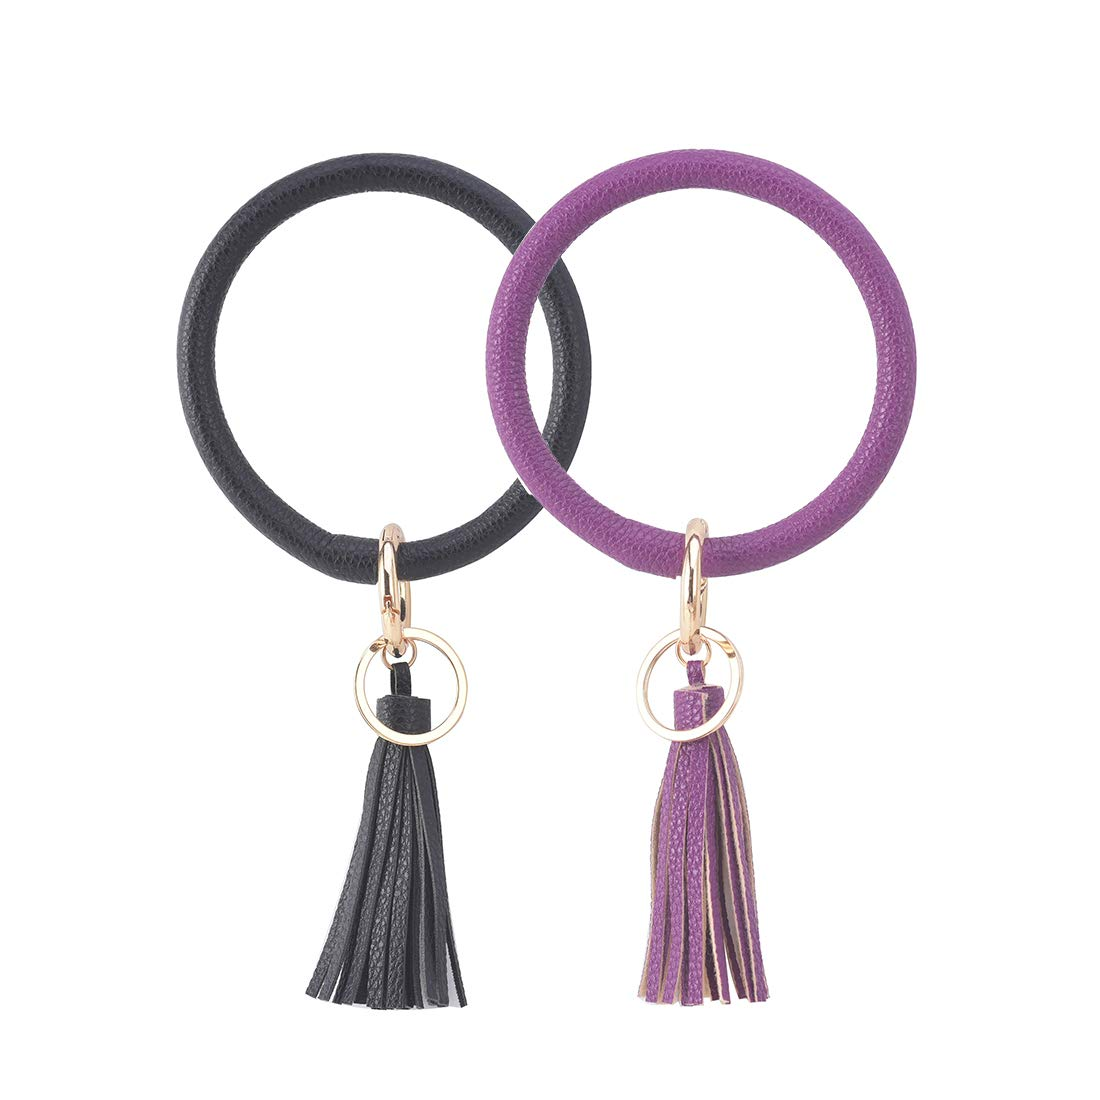 9f0d5a9888c25 2 Pcs Big Bracelet Bangle Keychain Keyring - Large Circle Wrist Leather  Bracelet Key Holder Key Chain Key Ring By Coolcos Black & Purple